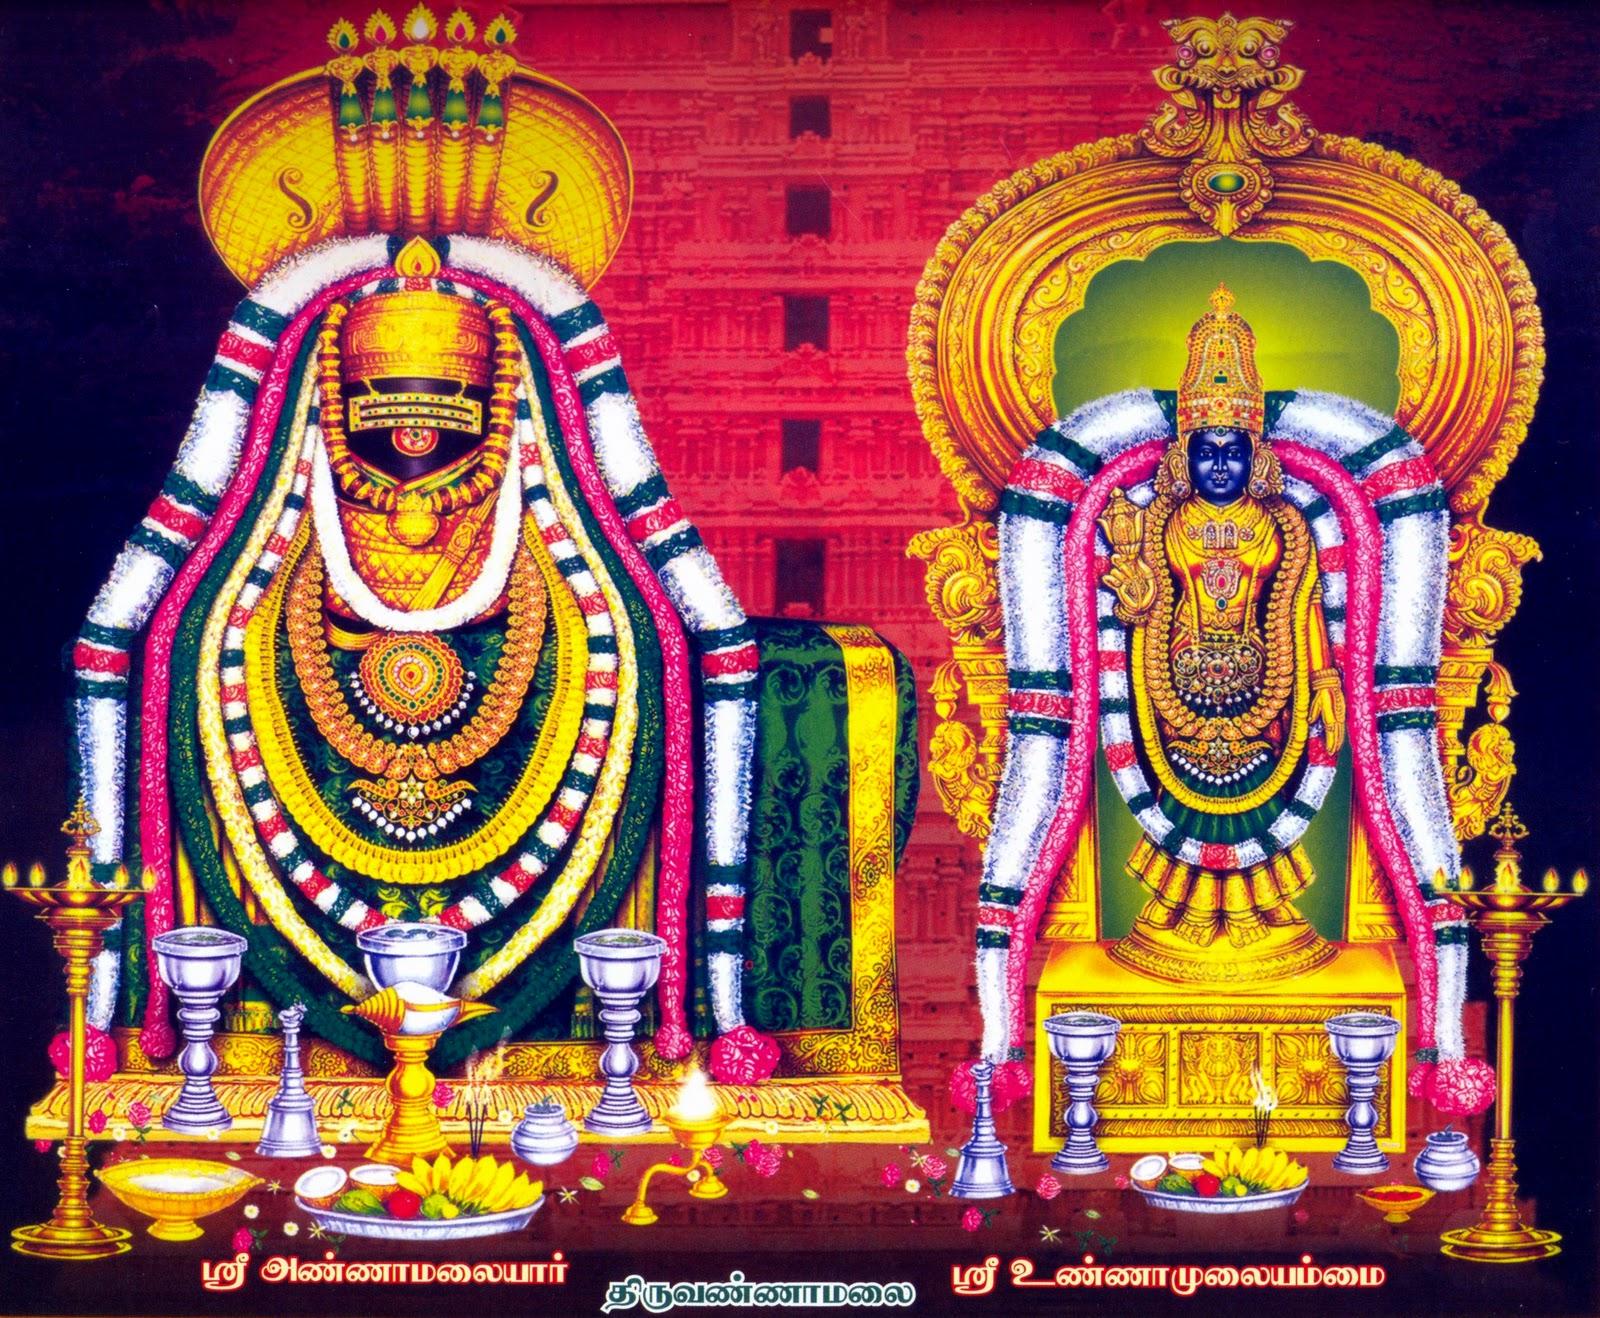 arunachaleswarar unnamalaiyaal tiruvannamalai temple tamilnadu